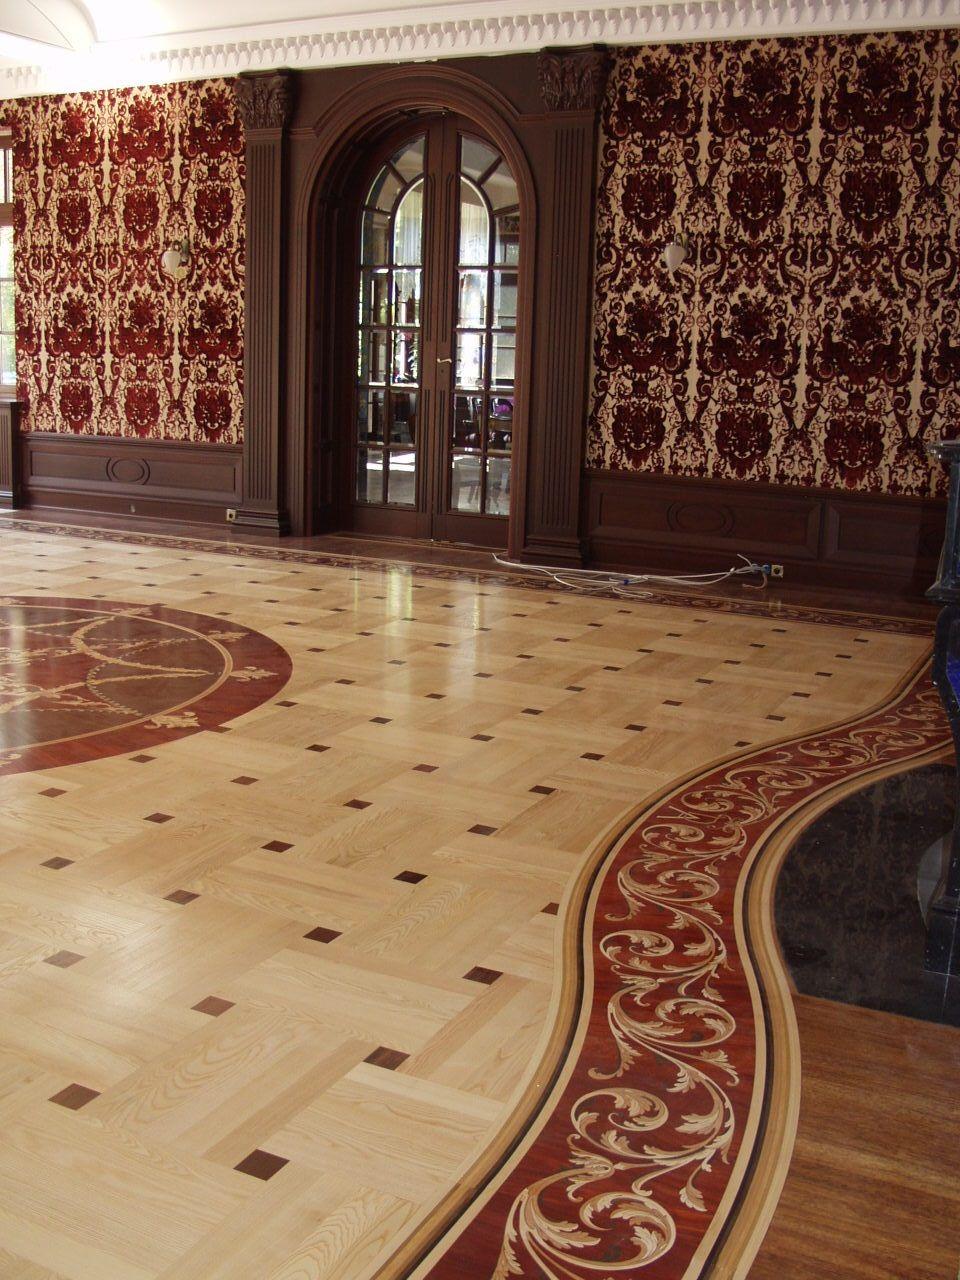 Custom Hardwood Floor Parquet Border Design By Renaissance